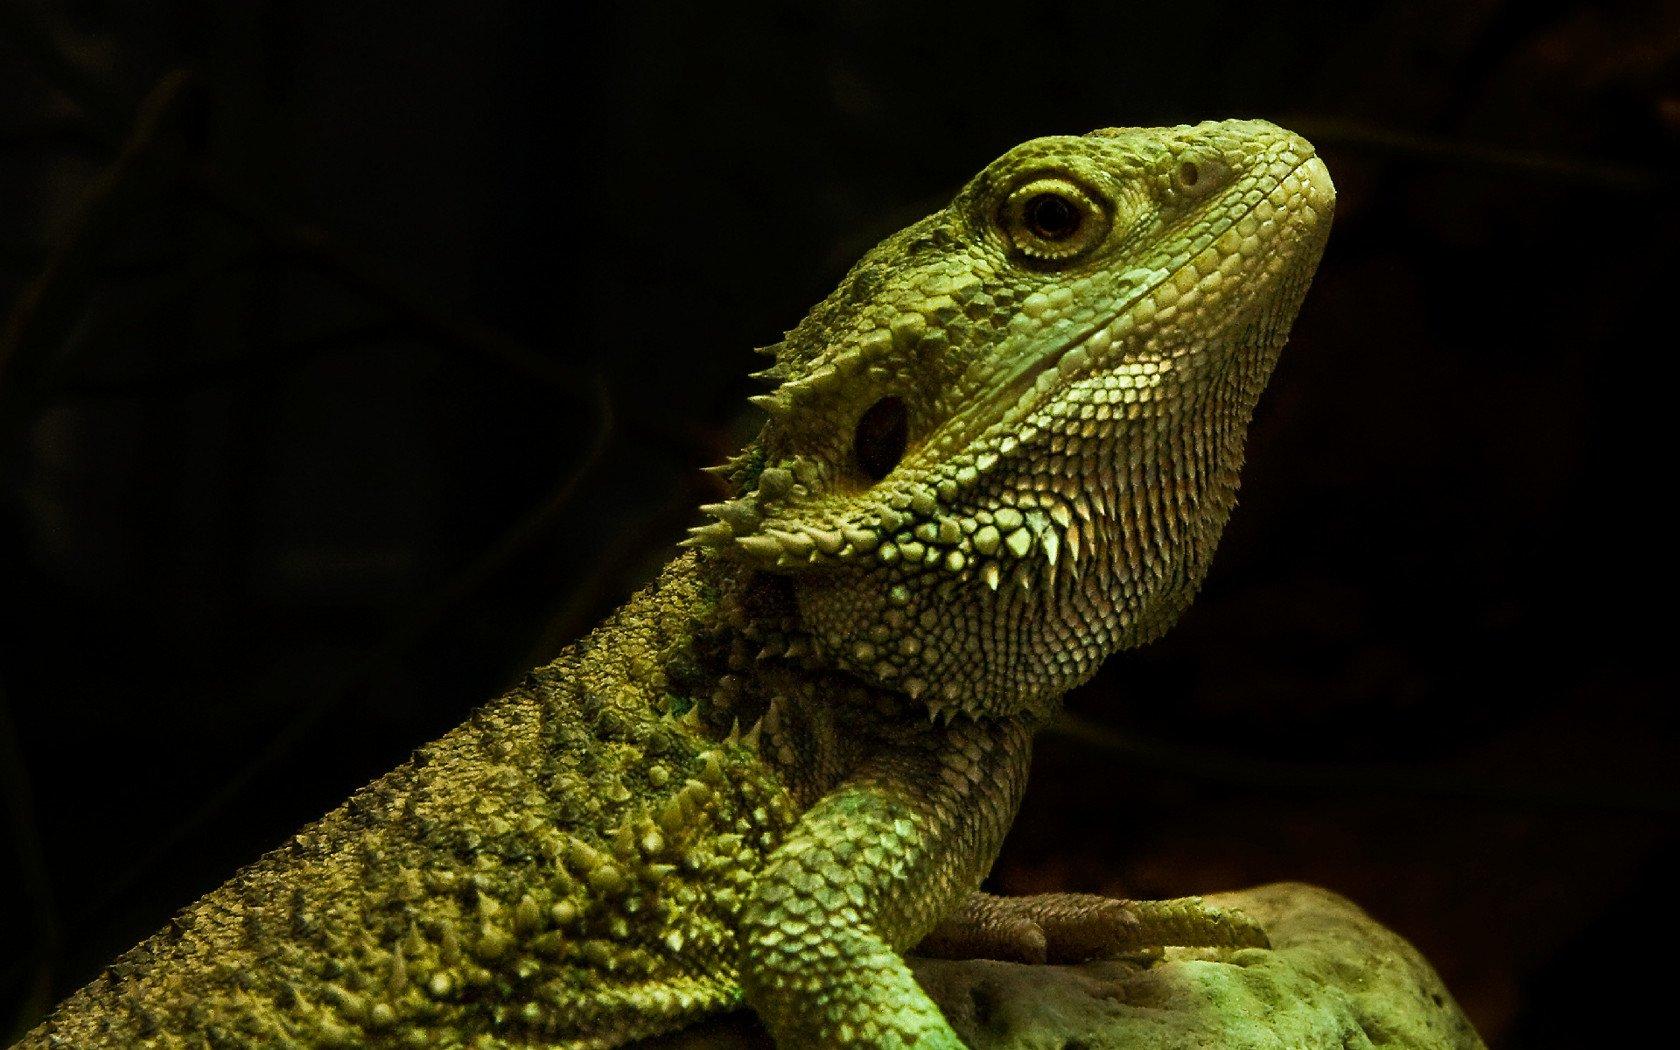 wonderful Lizard image